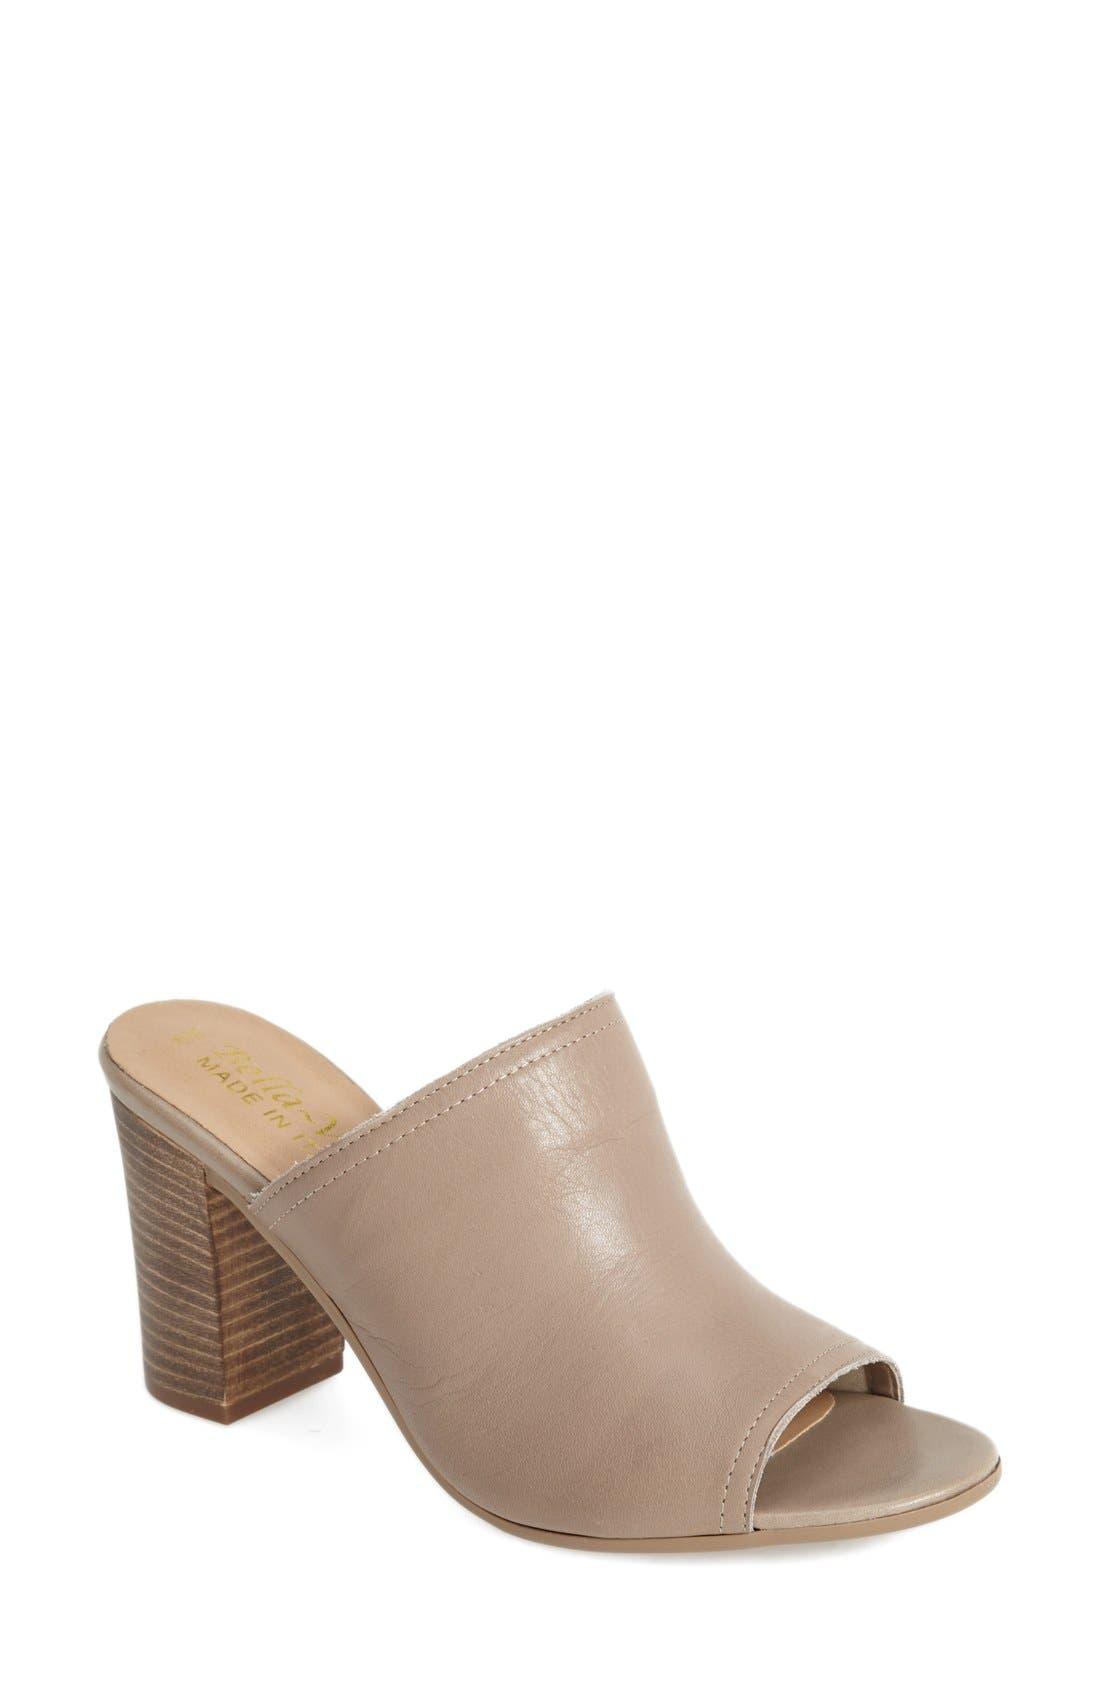 Main Image - Bella Vita 'Arno' Leather Mule (Women)